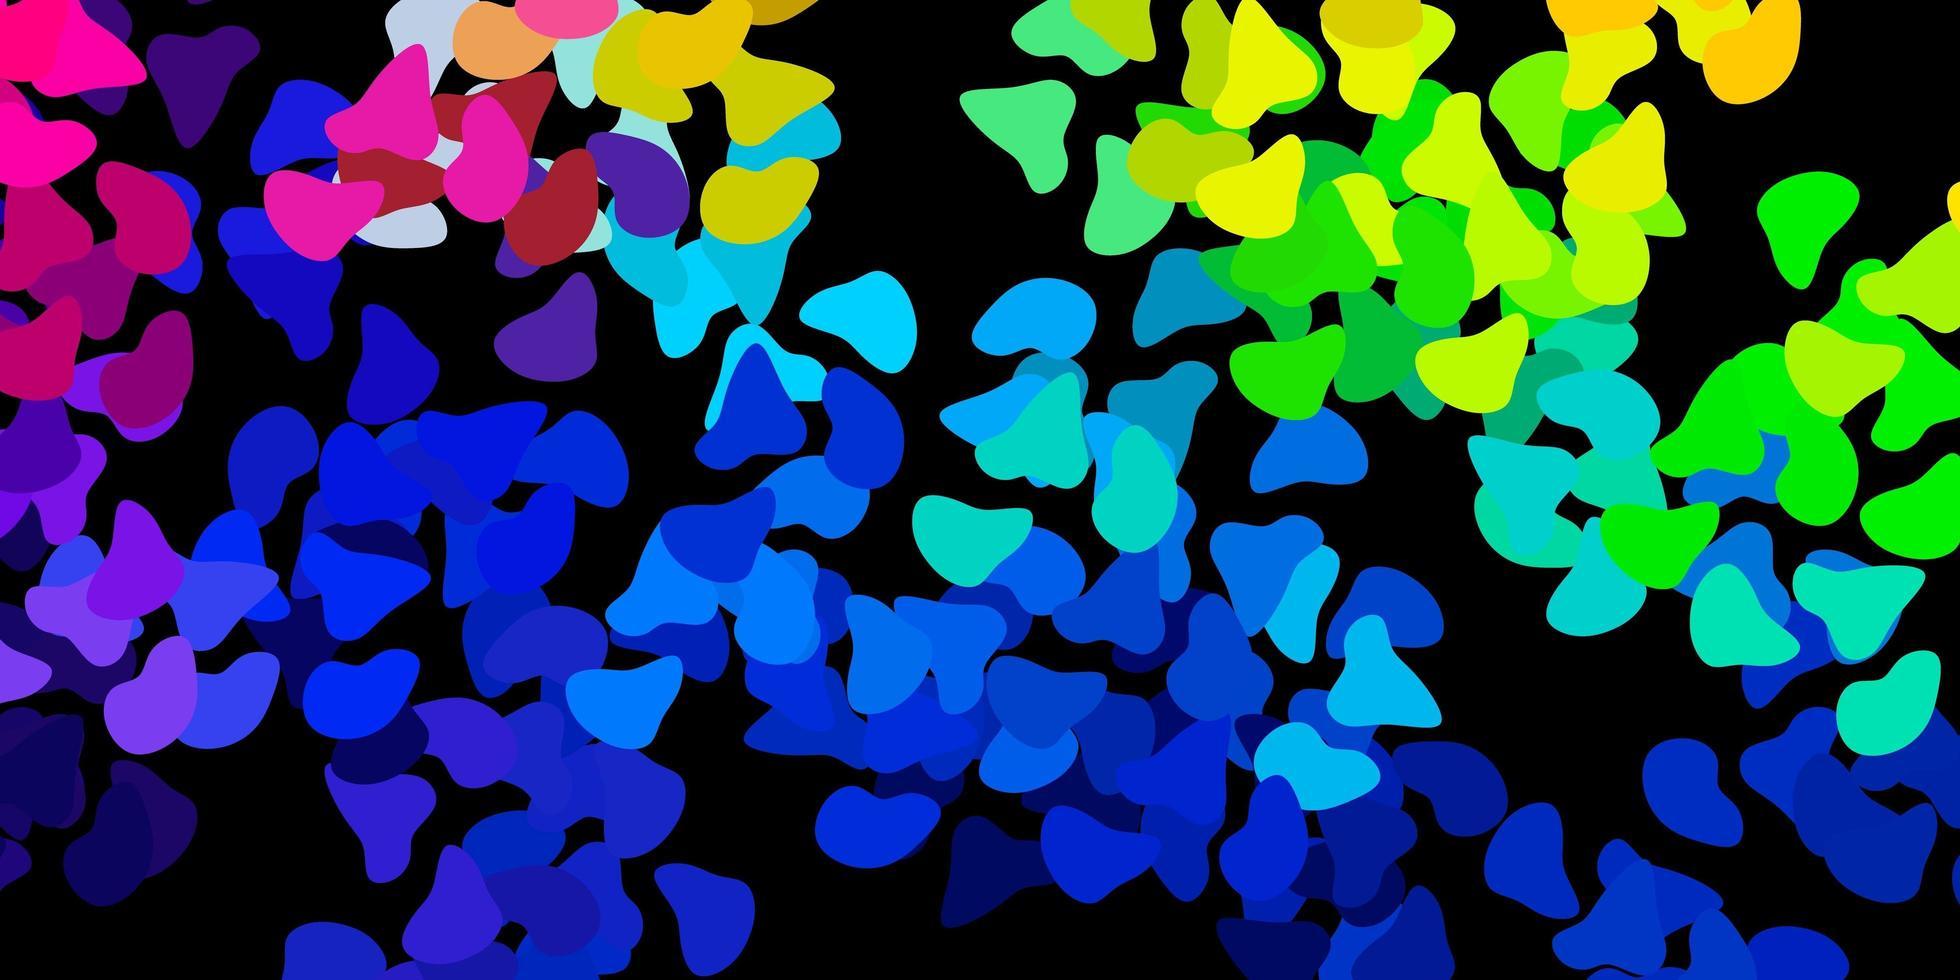 textura de vector multicolor oscuro con formas de memphis